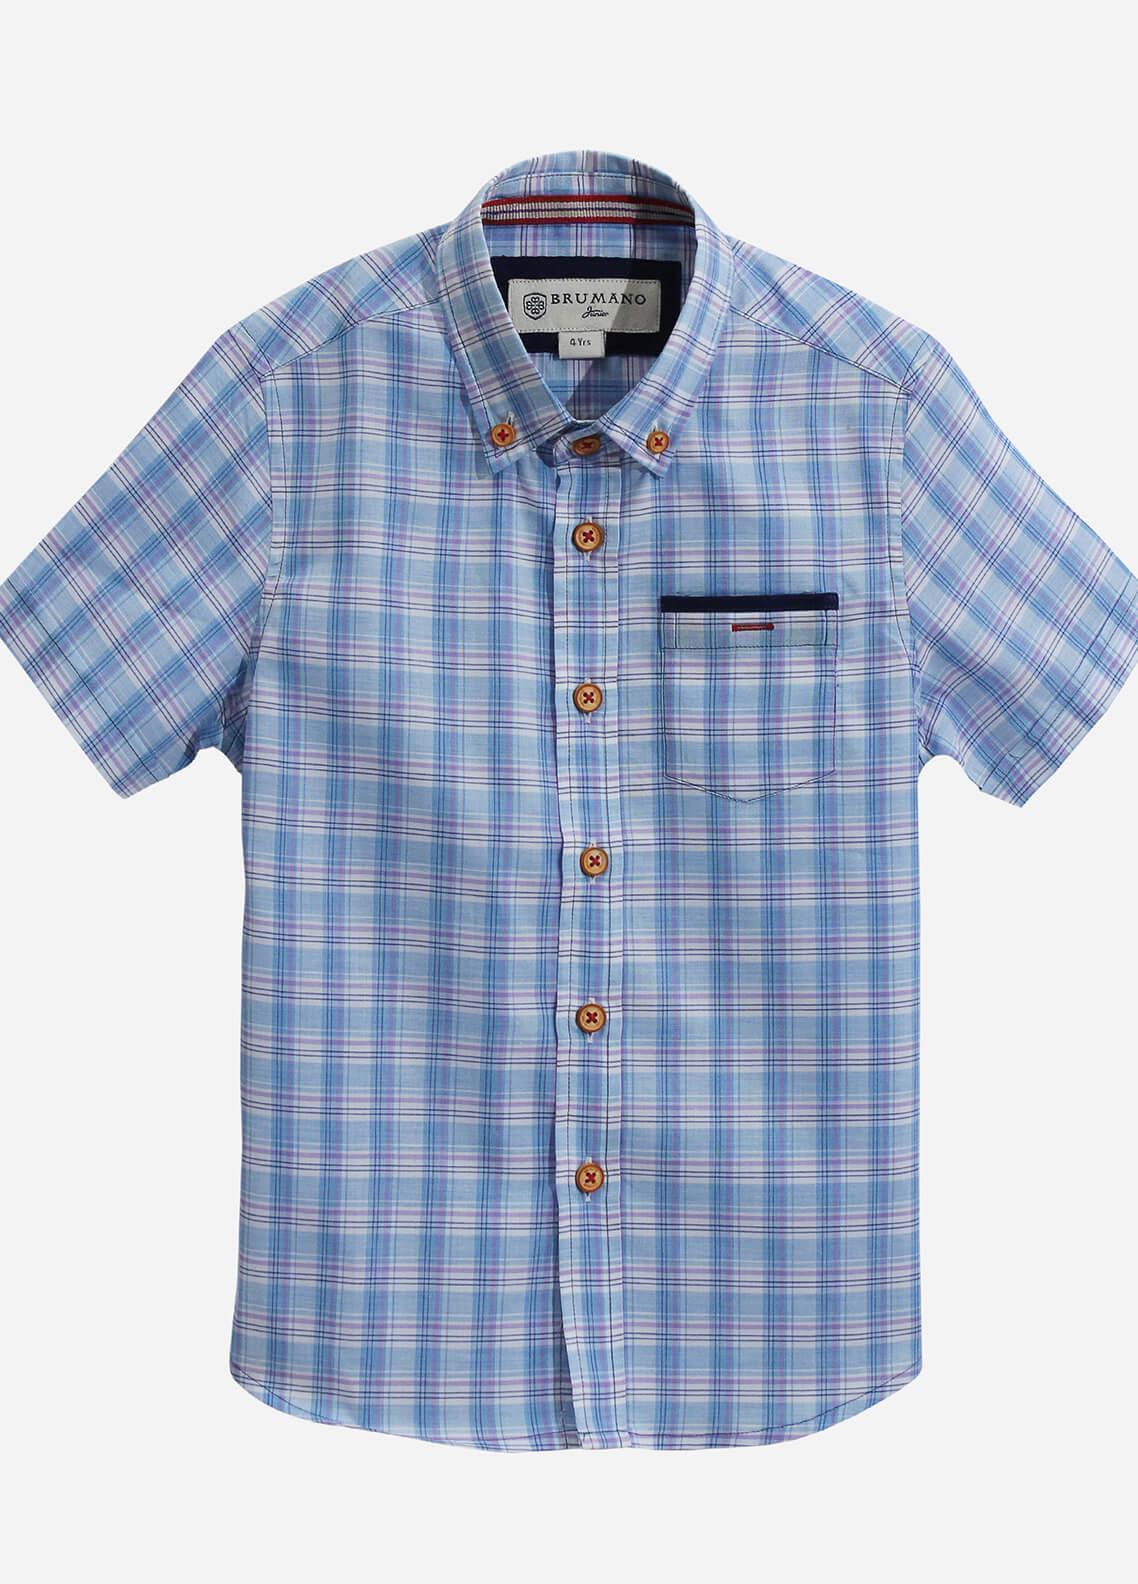 Brumano Cotton Casual Boys Shirts - Blue BRM-817